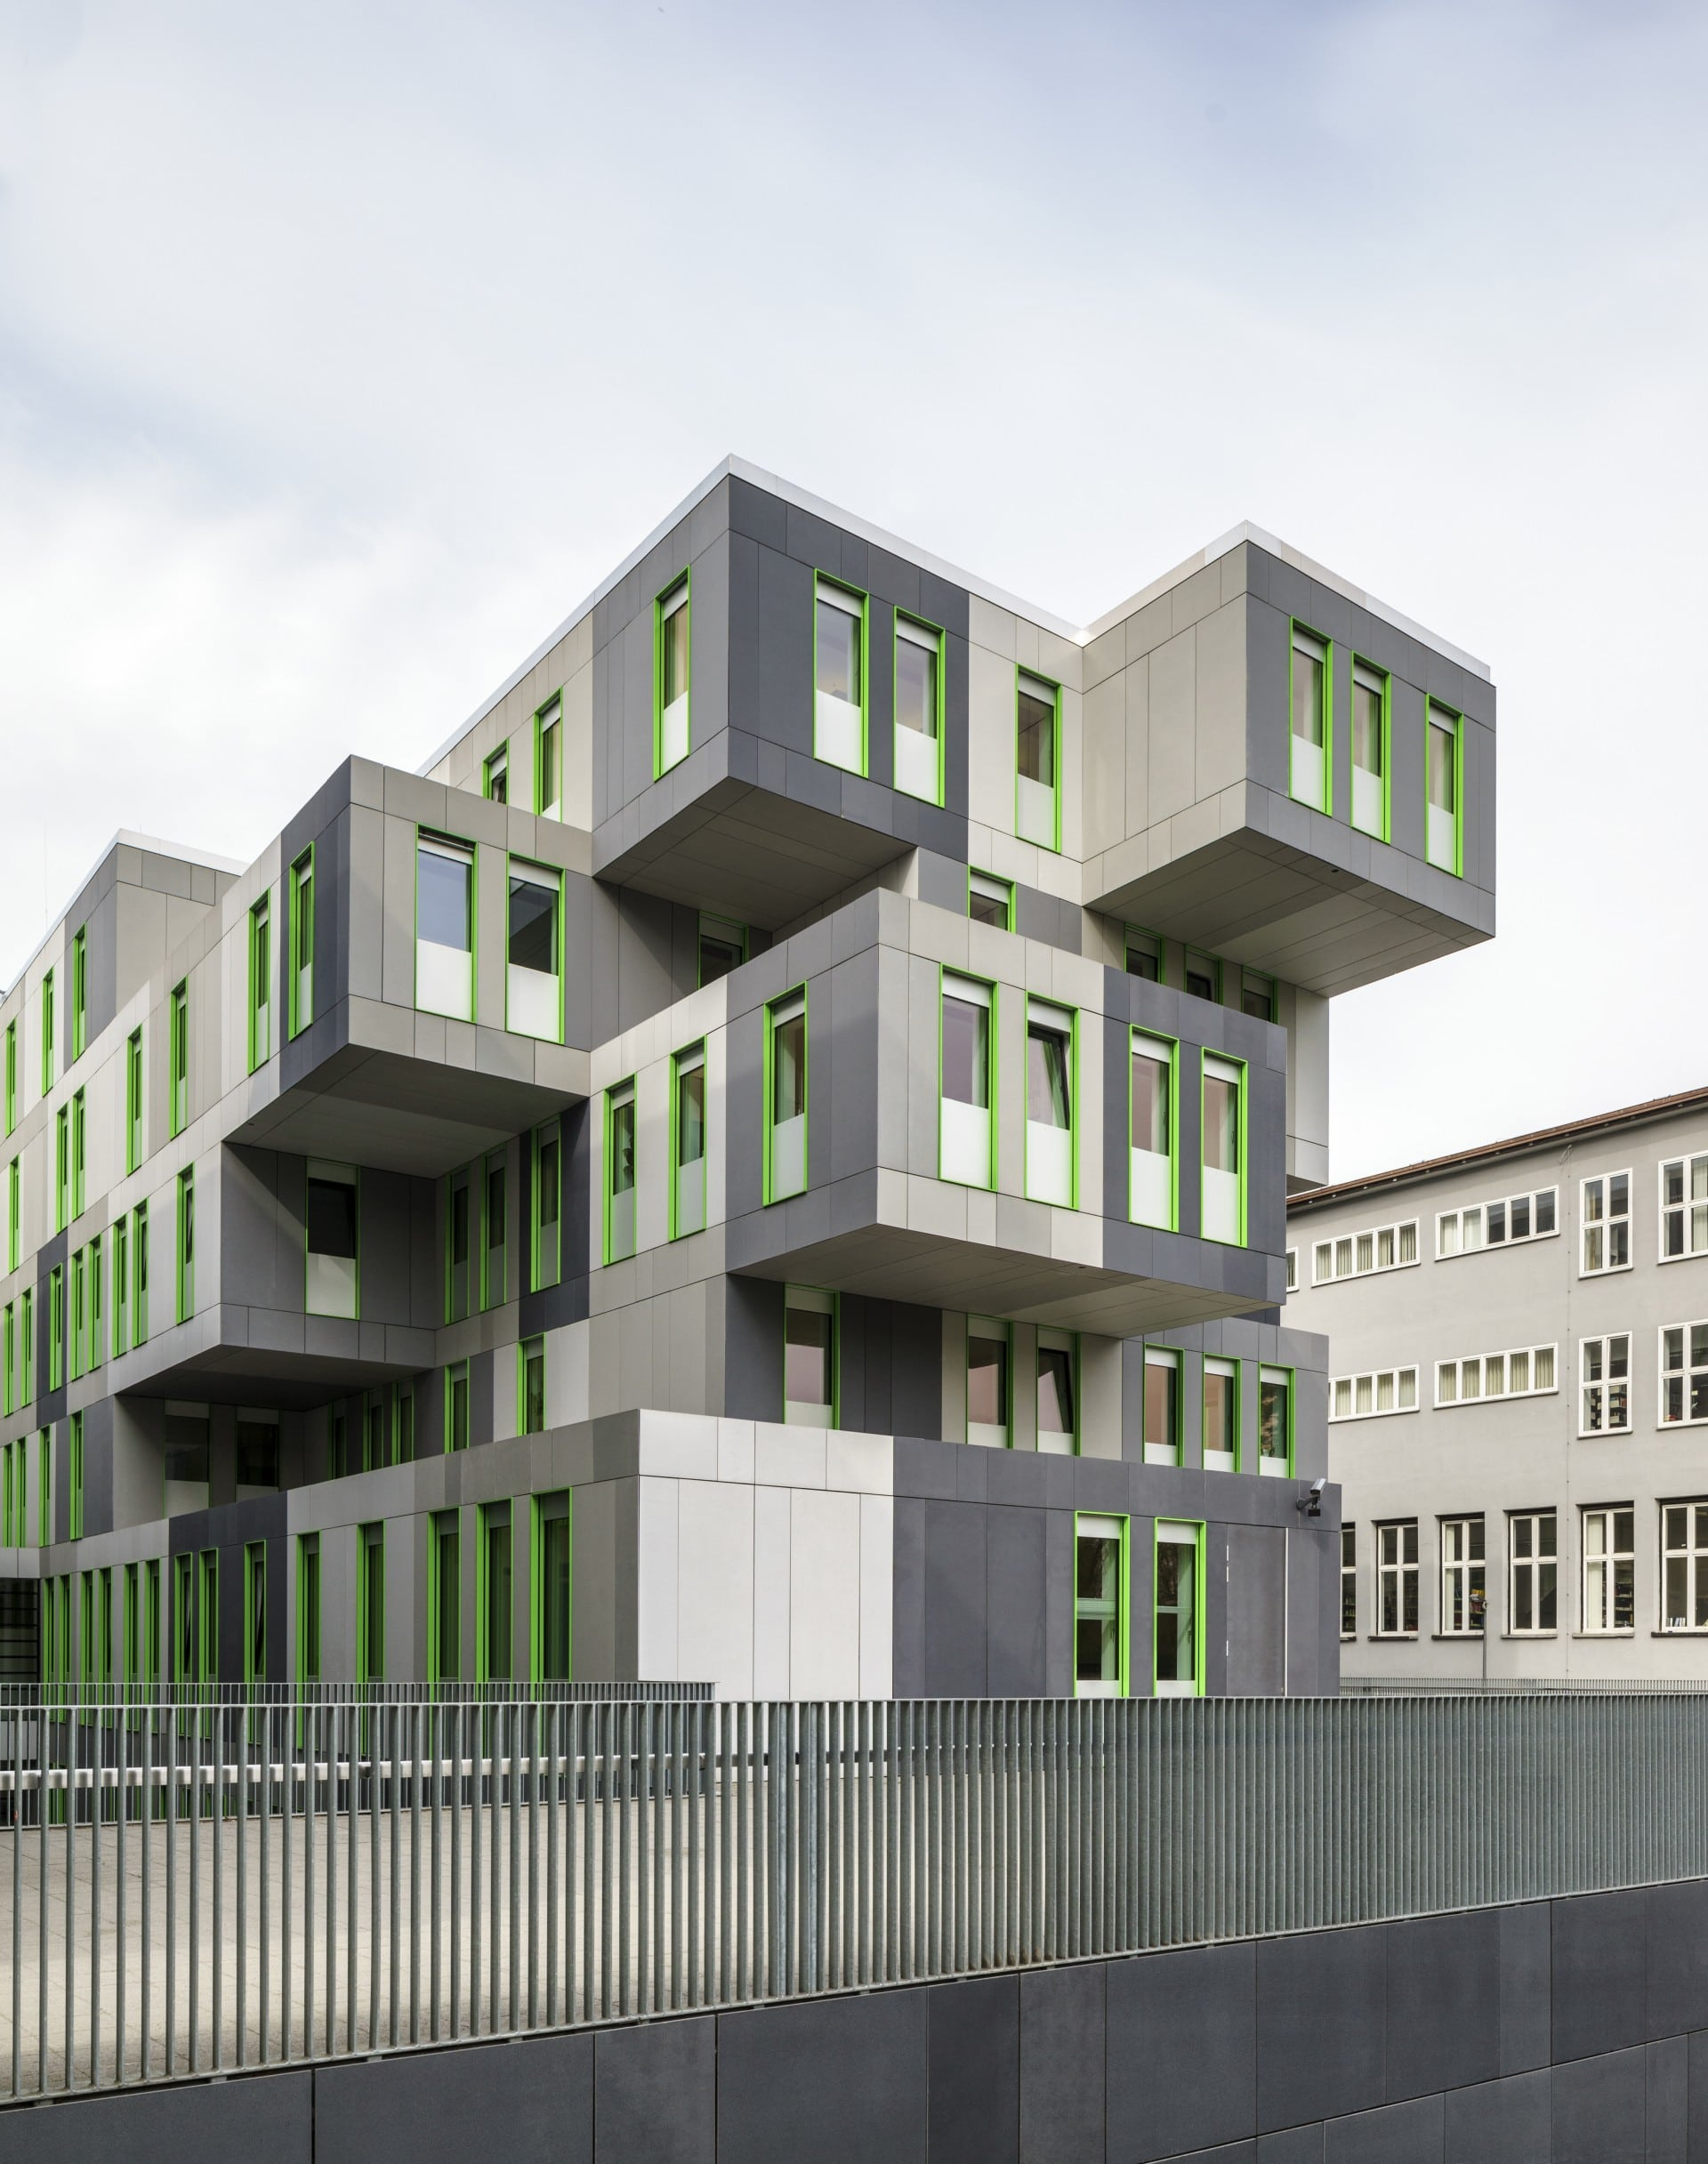 263-Chris-Franken-Architekturfotos-vBUbIeCX